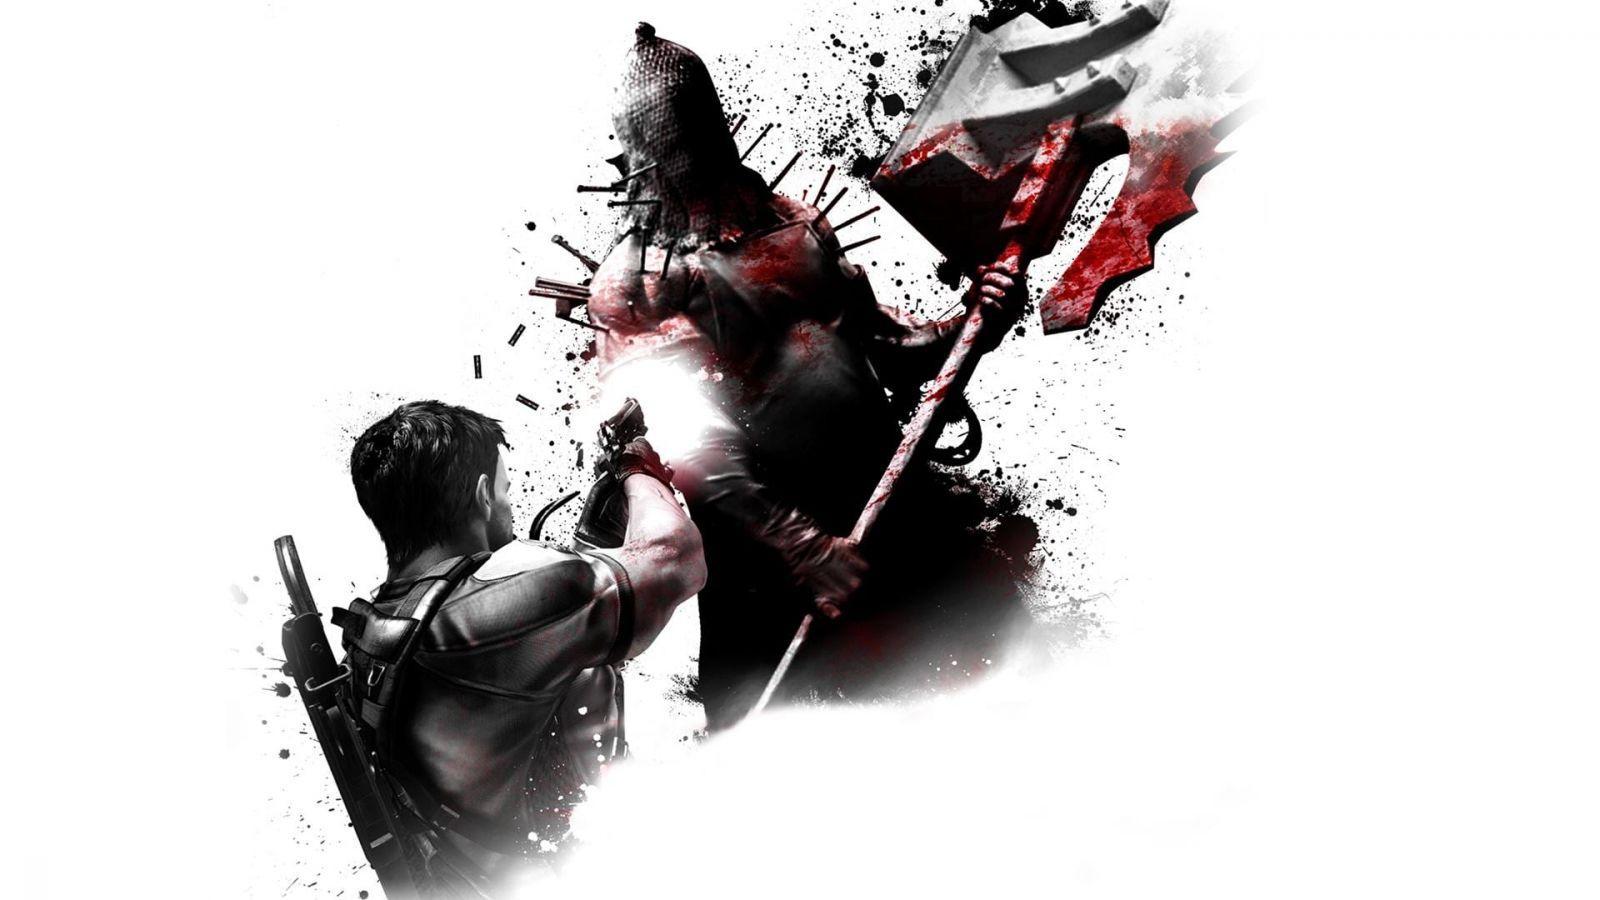 Новую часть Resident Evil покажут 9 сентября (24 1)